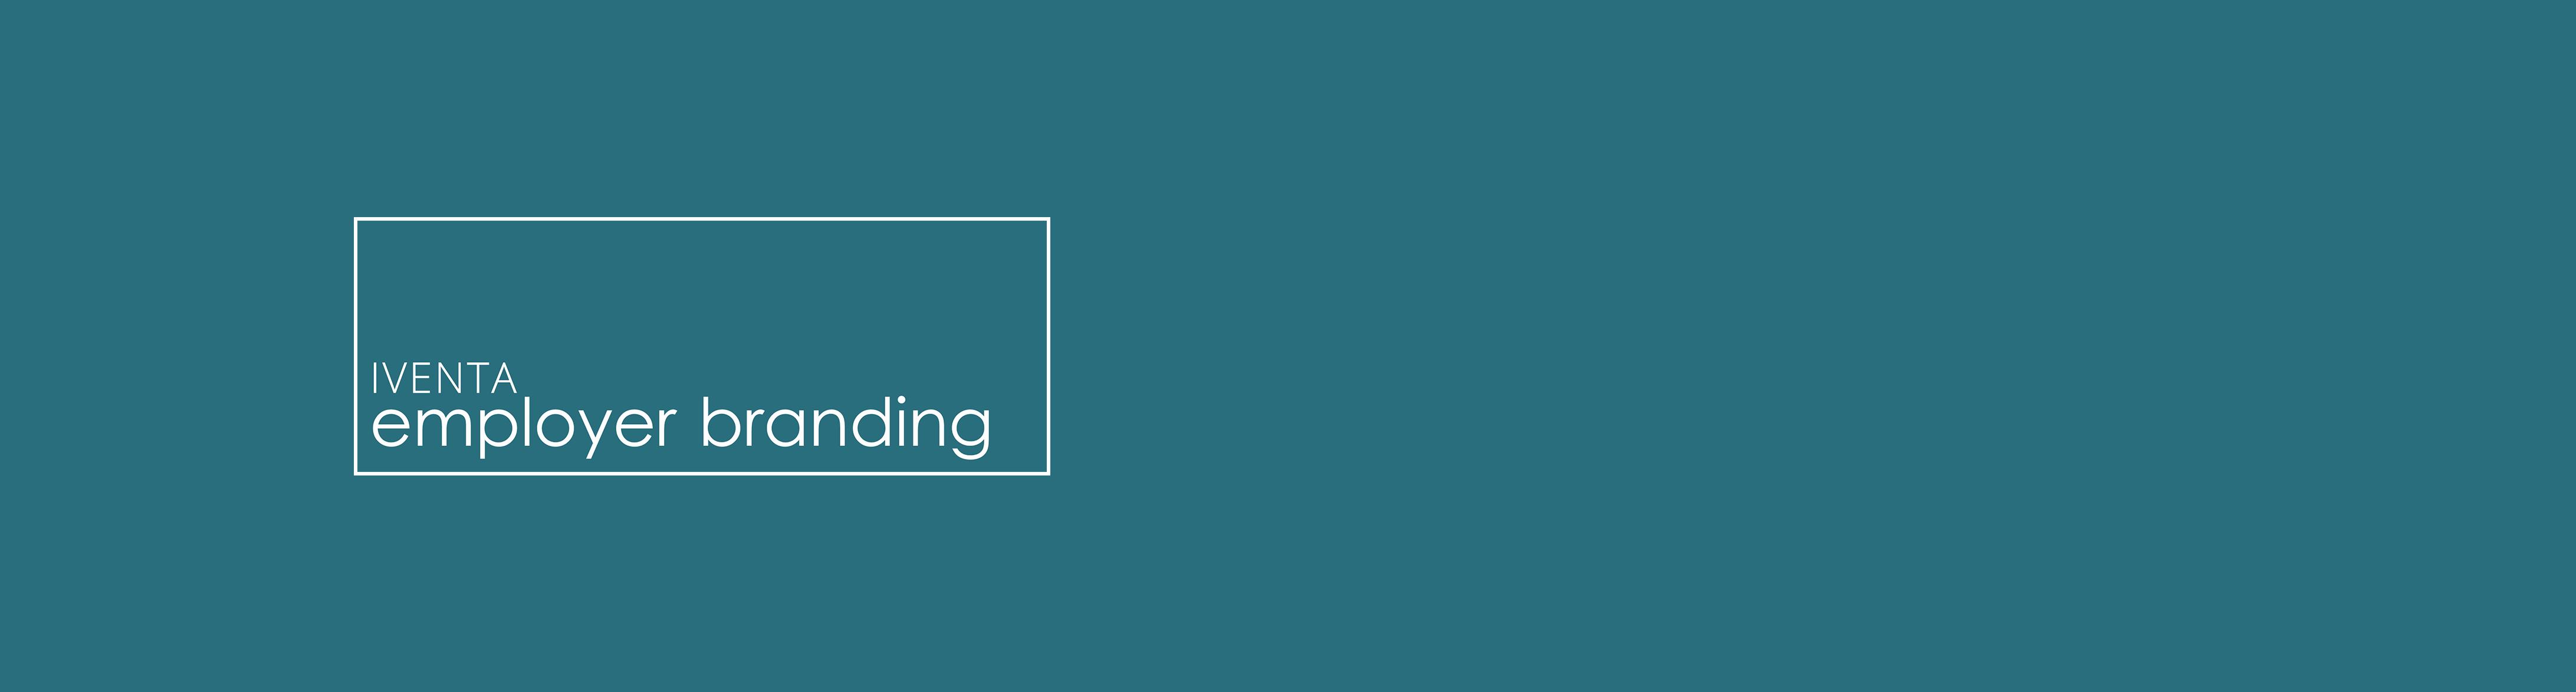 Iventa Employer Branding Logo